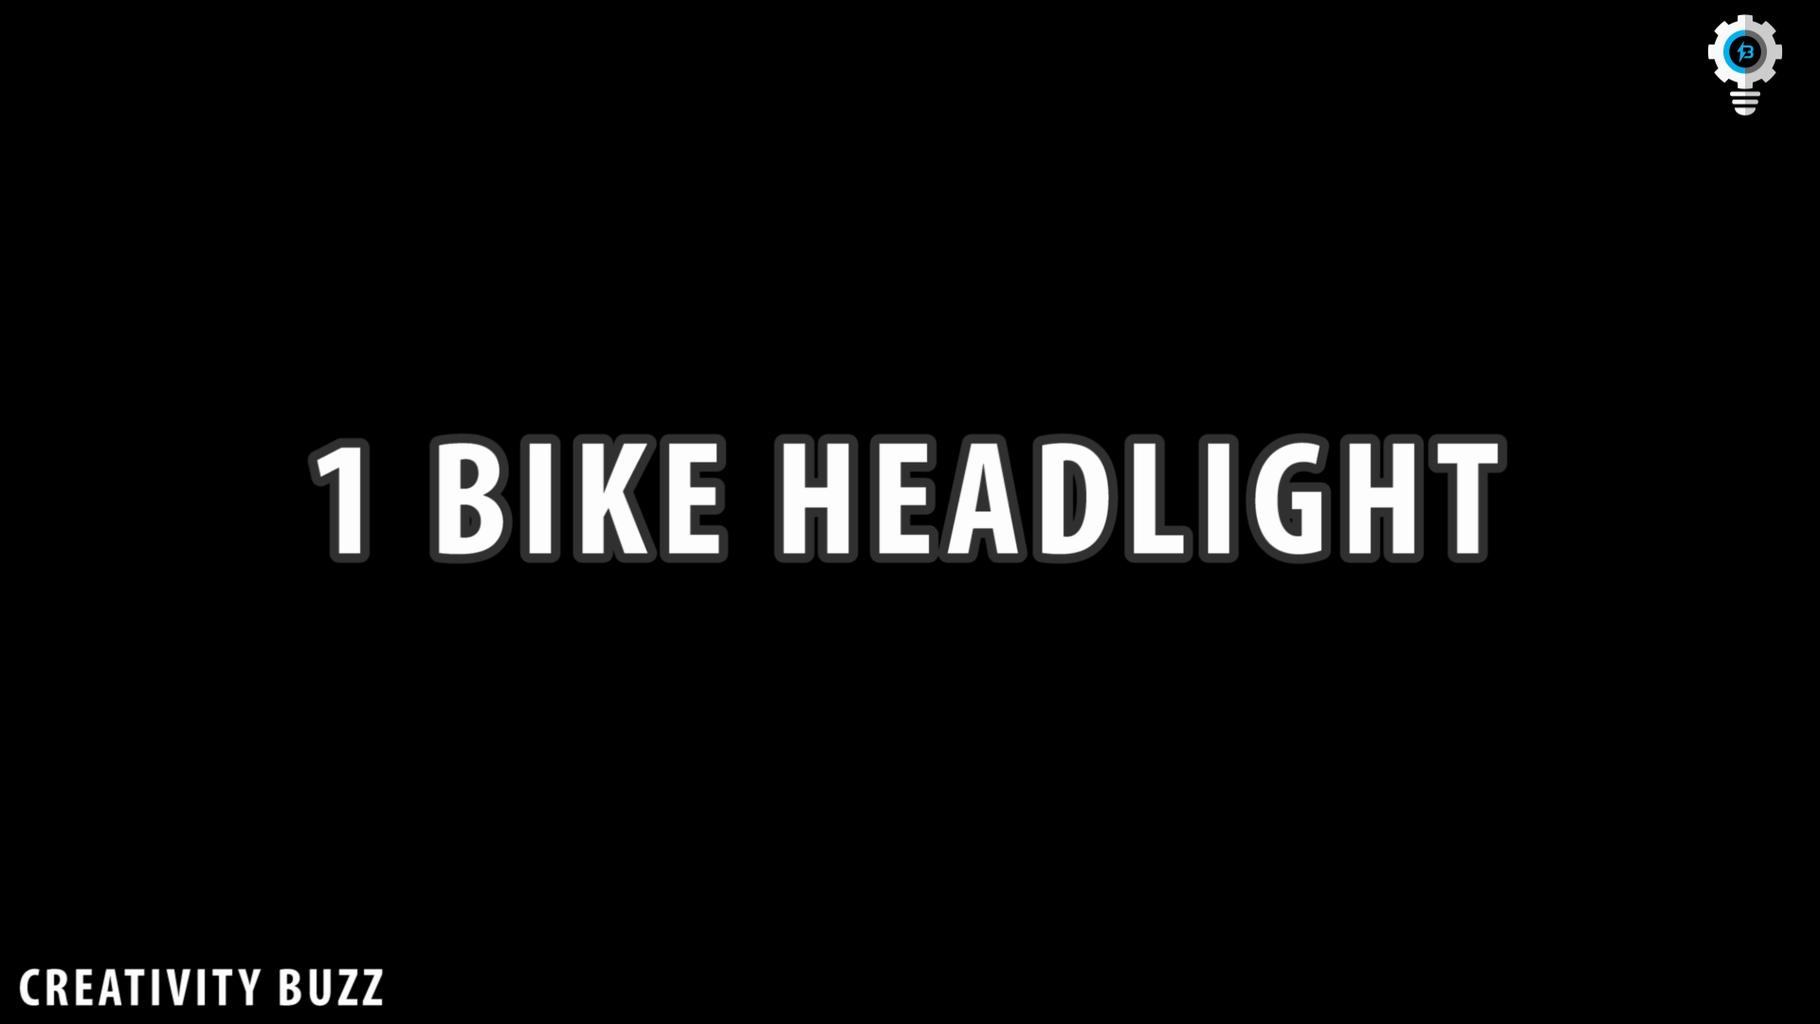 Polish Off Your Car/Bike Headlights